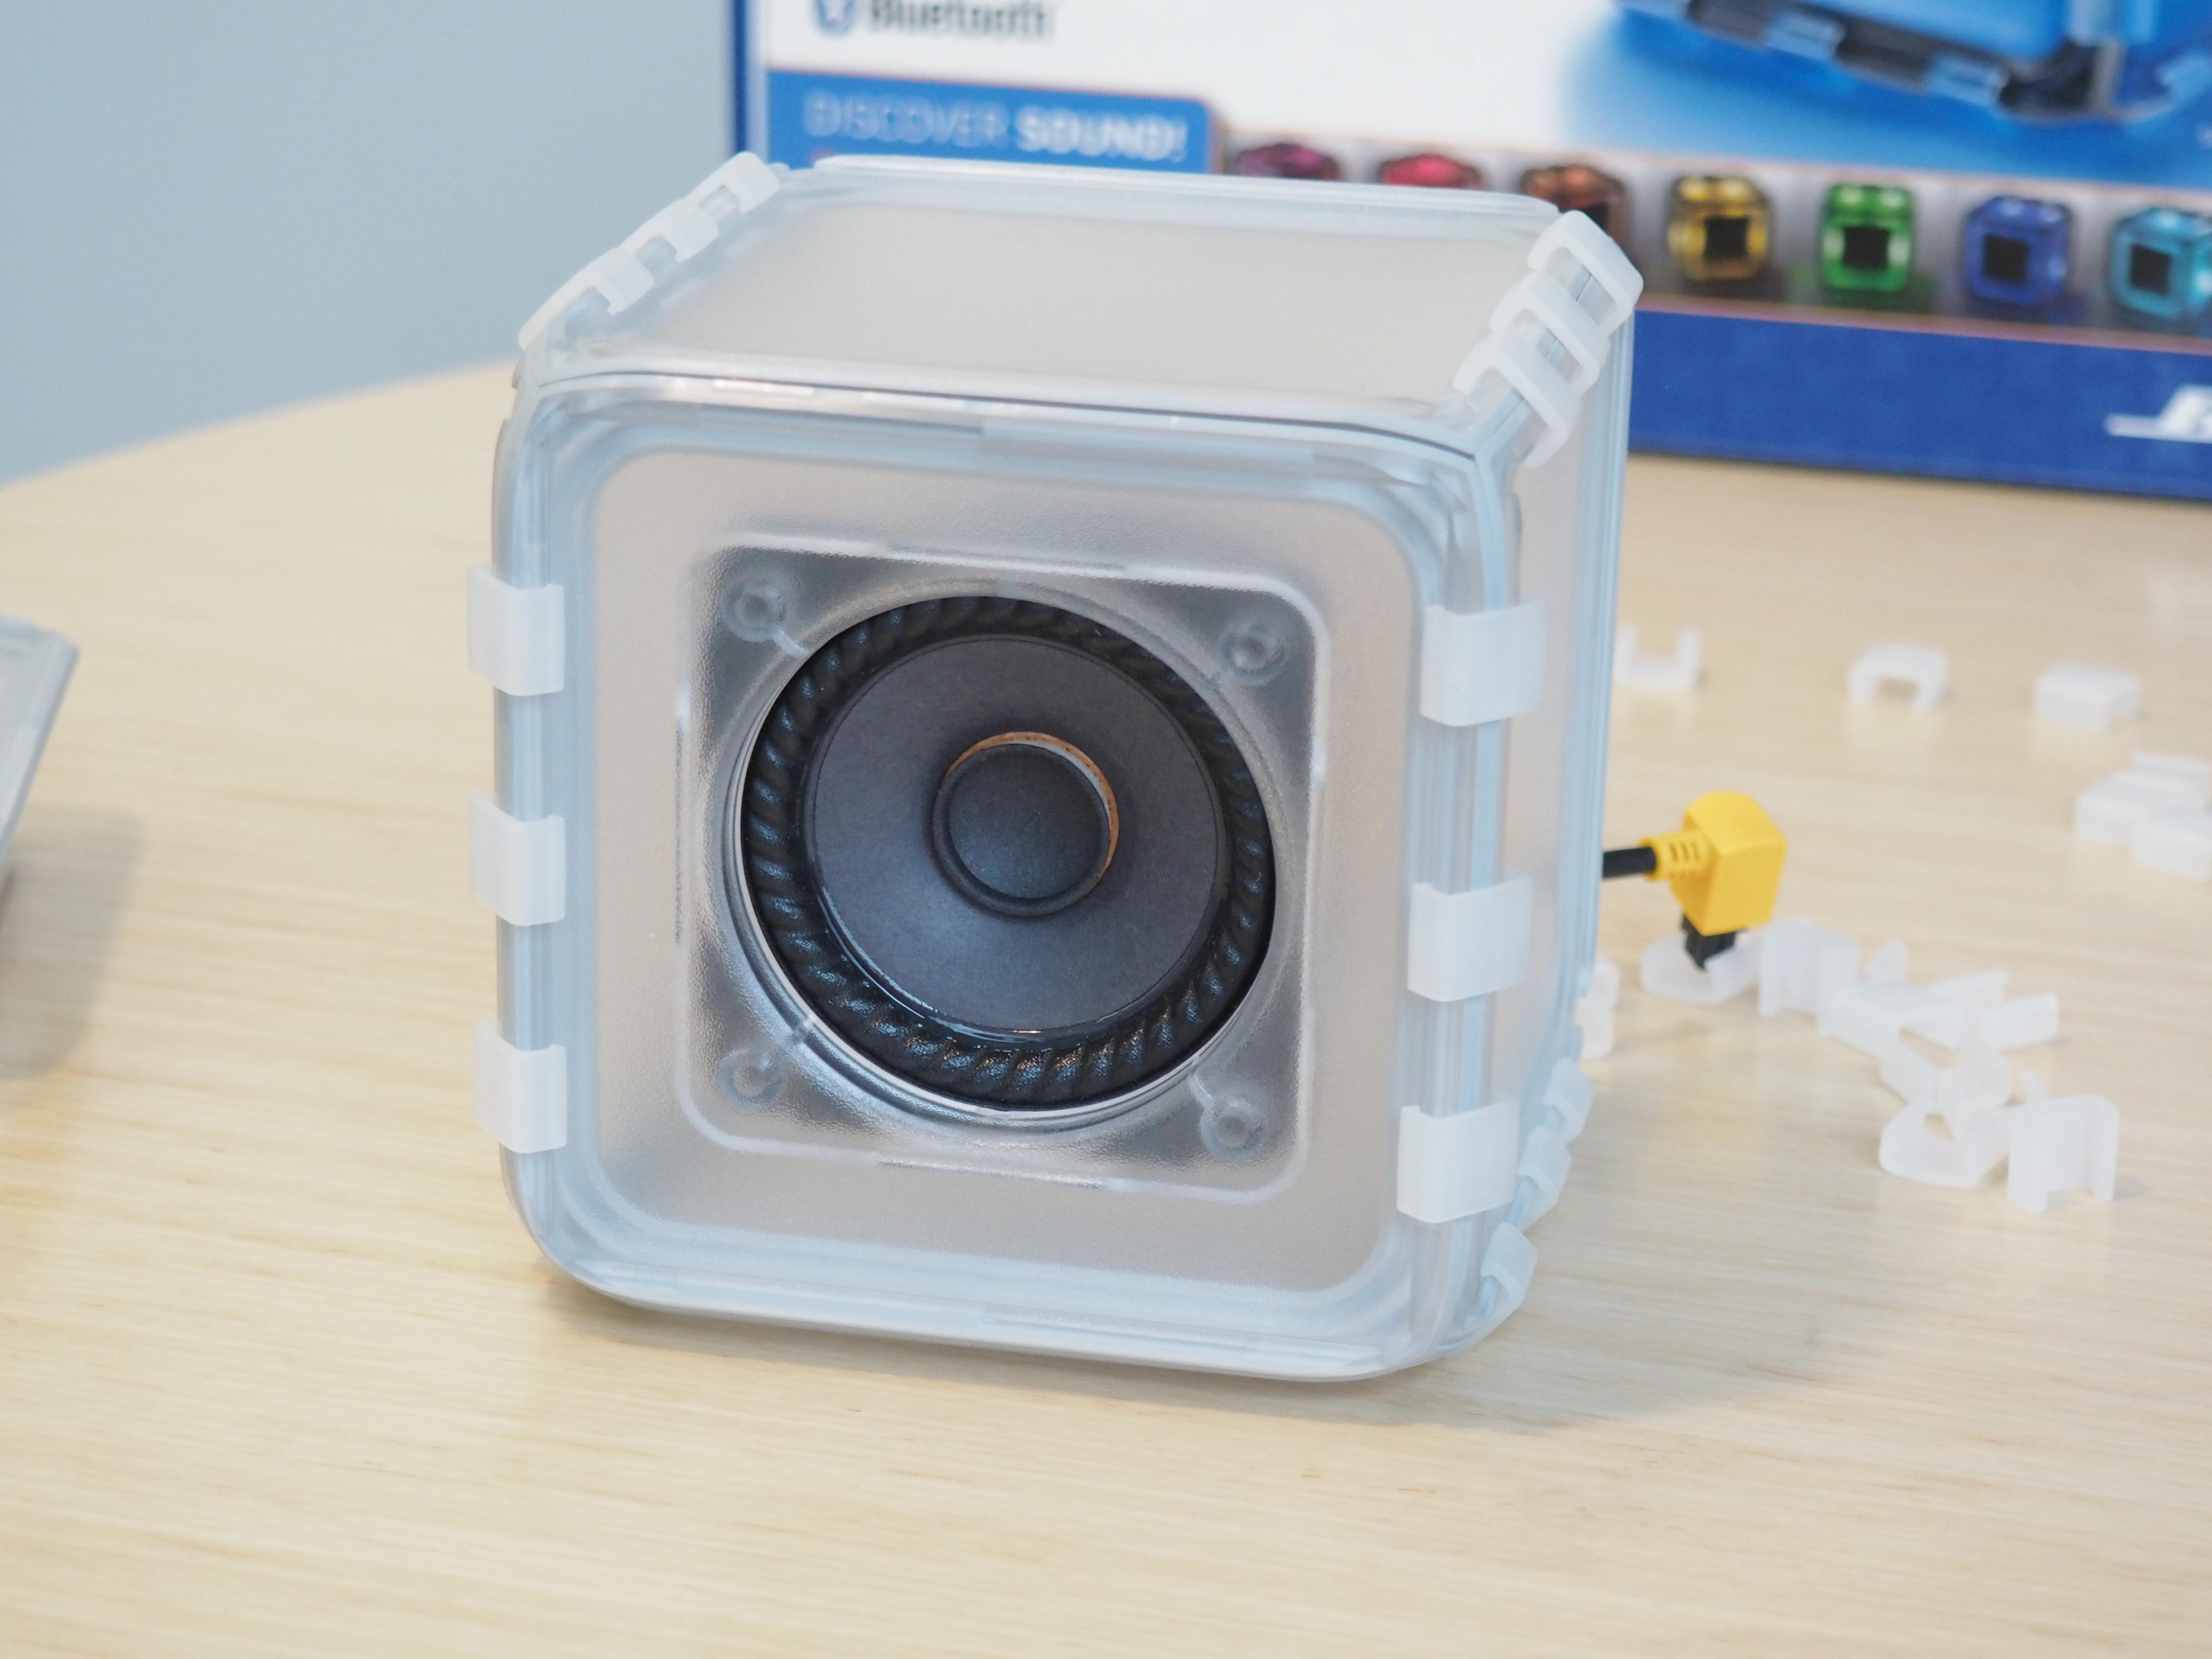 Bosebuild Speaker Cube : the bosebuild speaker cube educational kit isn t quite fully formed techcrunch ~ Russianpoet.info Haus und Dekorationen